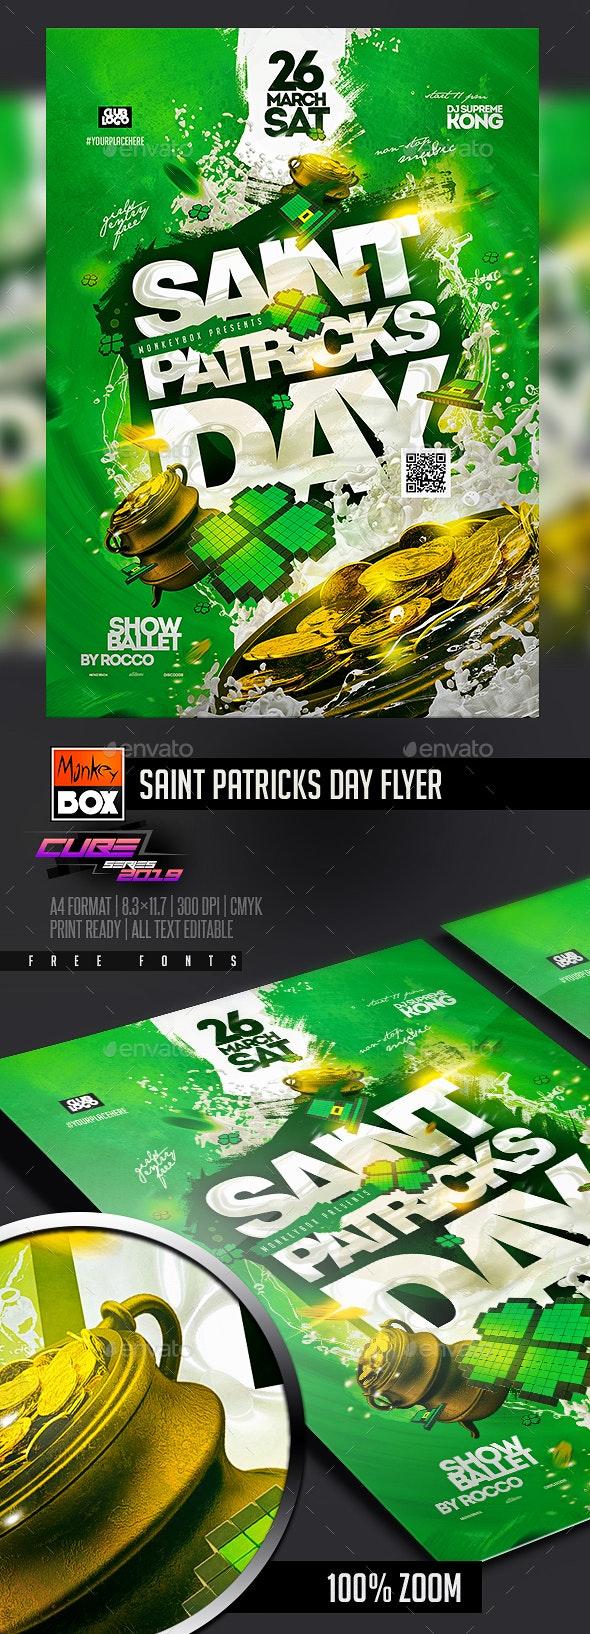 Saint Patricks Day Flyer - Clubs & Parties Events